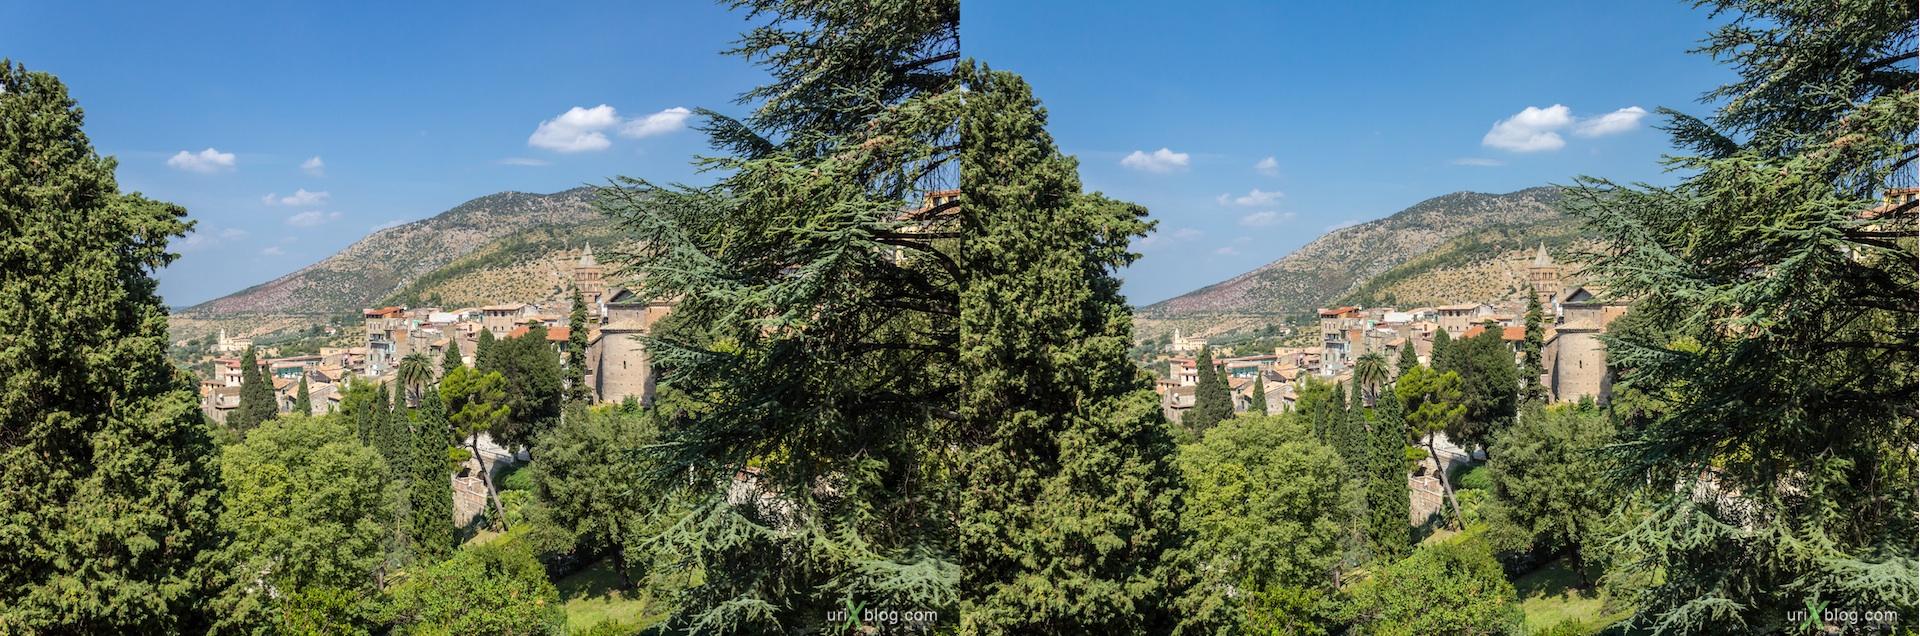 2012, villa D'Este, Italy, Tivoli, Rome, 3D, stereo pair, cross-eyed, crossview, cross view stereo pair